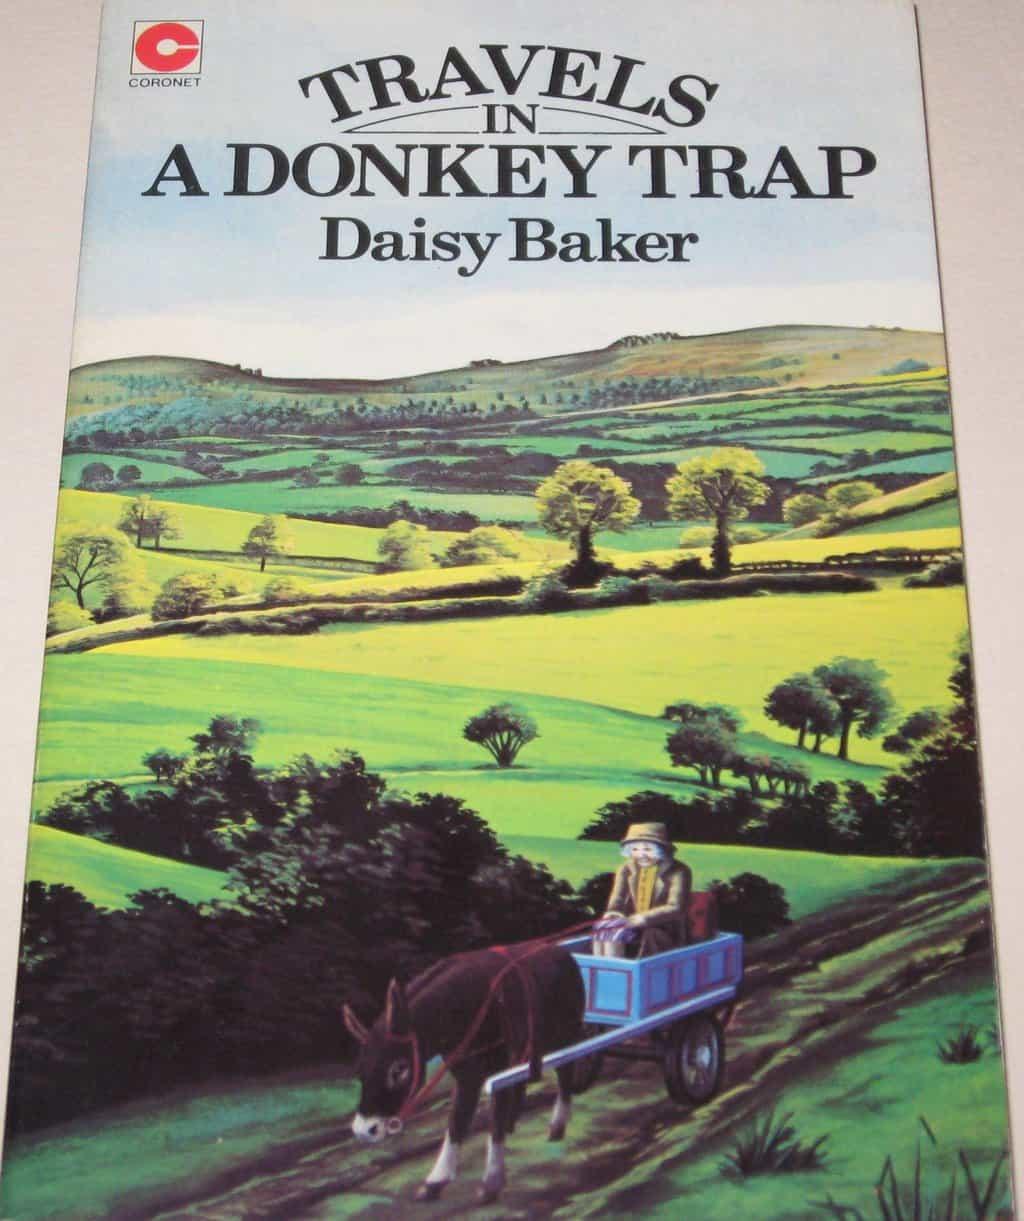 Travels in a Donkey Trap by Daisy Baker: